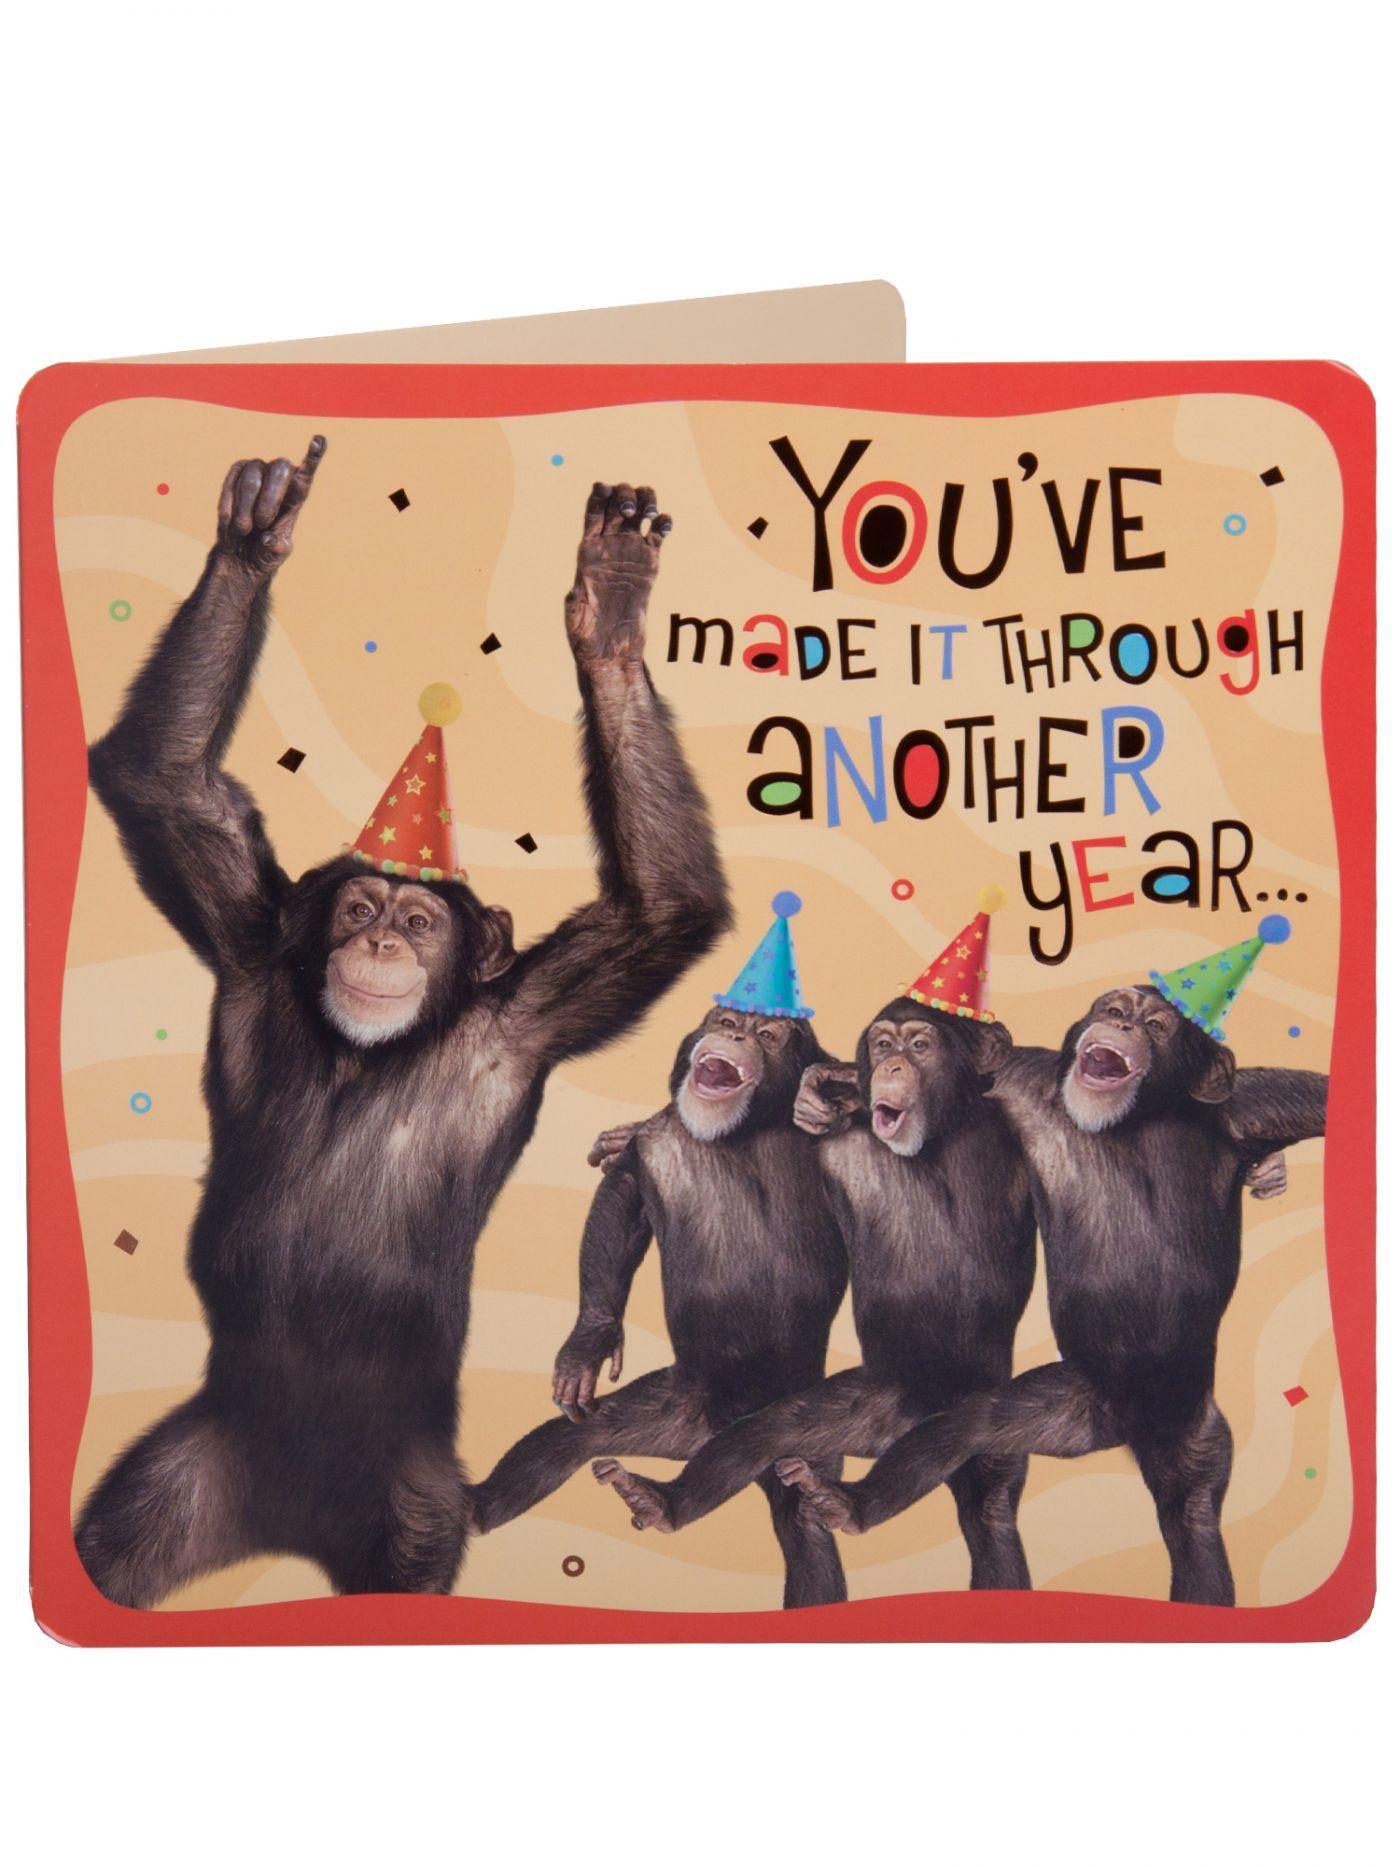 Monkeys having a party Birthday Sound Card Birthday Cards